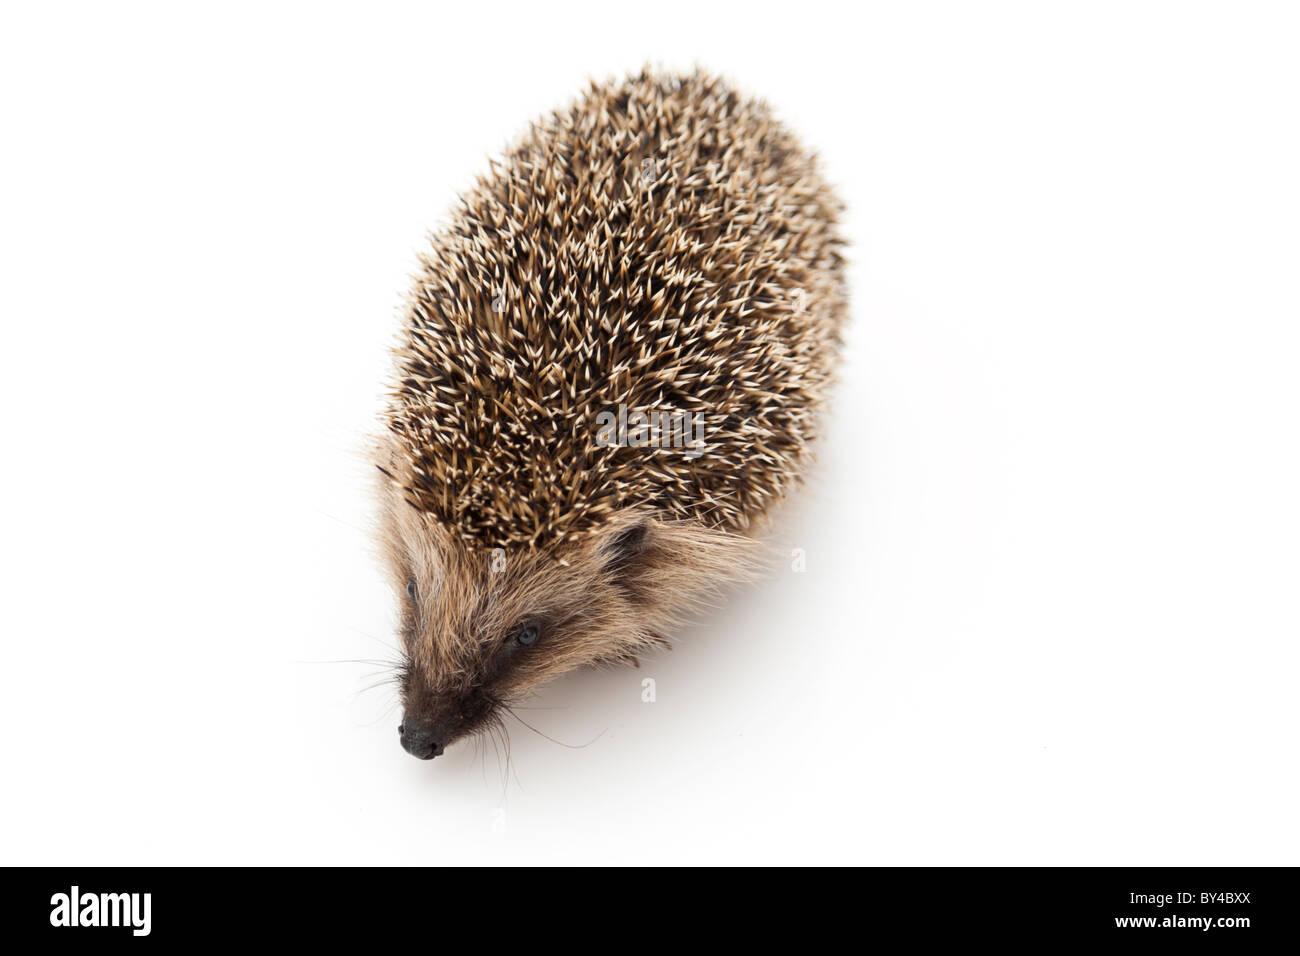 Little hedgehog - Stock Image